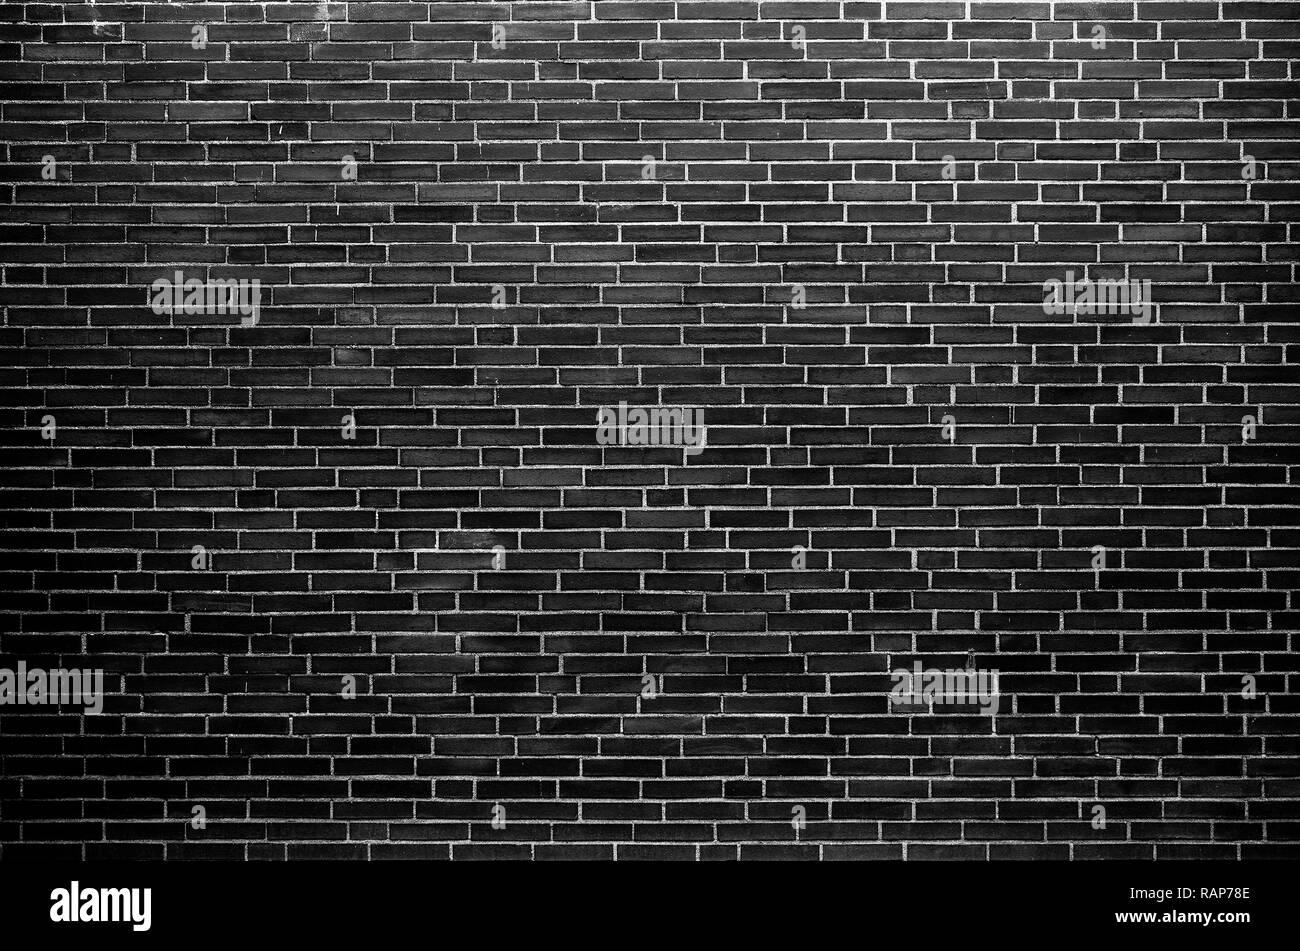 Grunge Stone Brick Wall Background Texture Photo - Stock Image